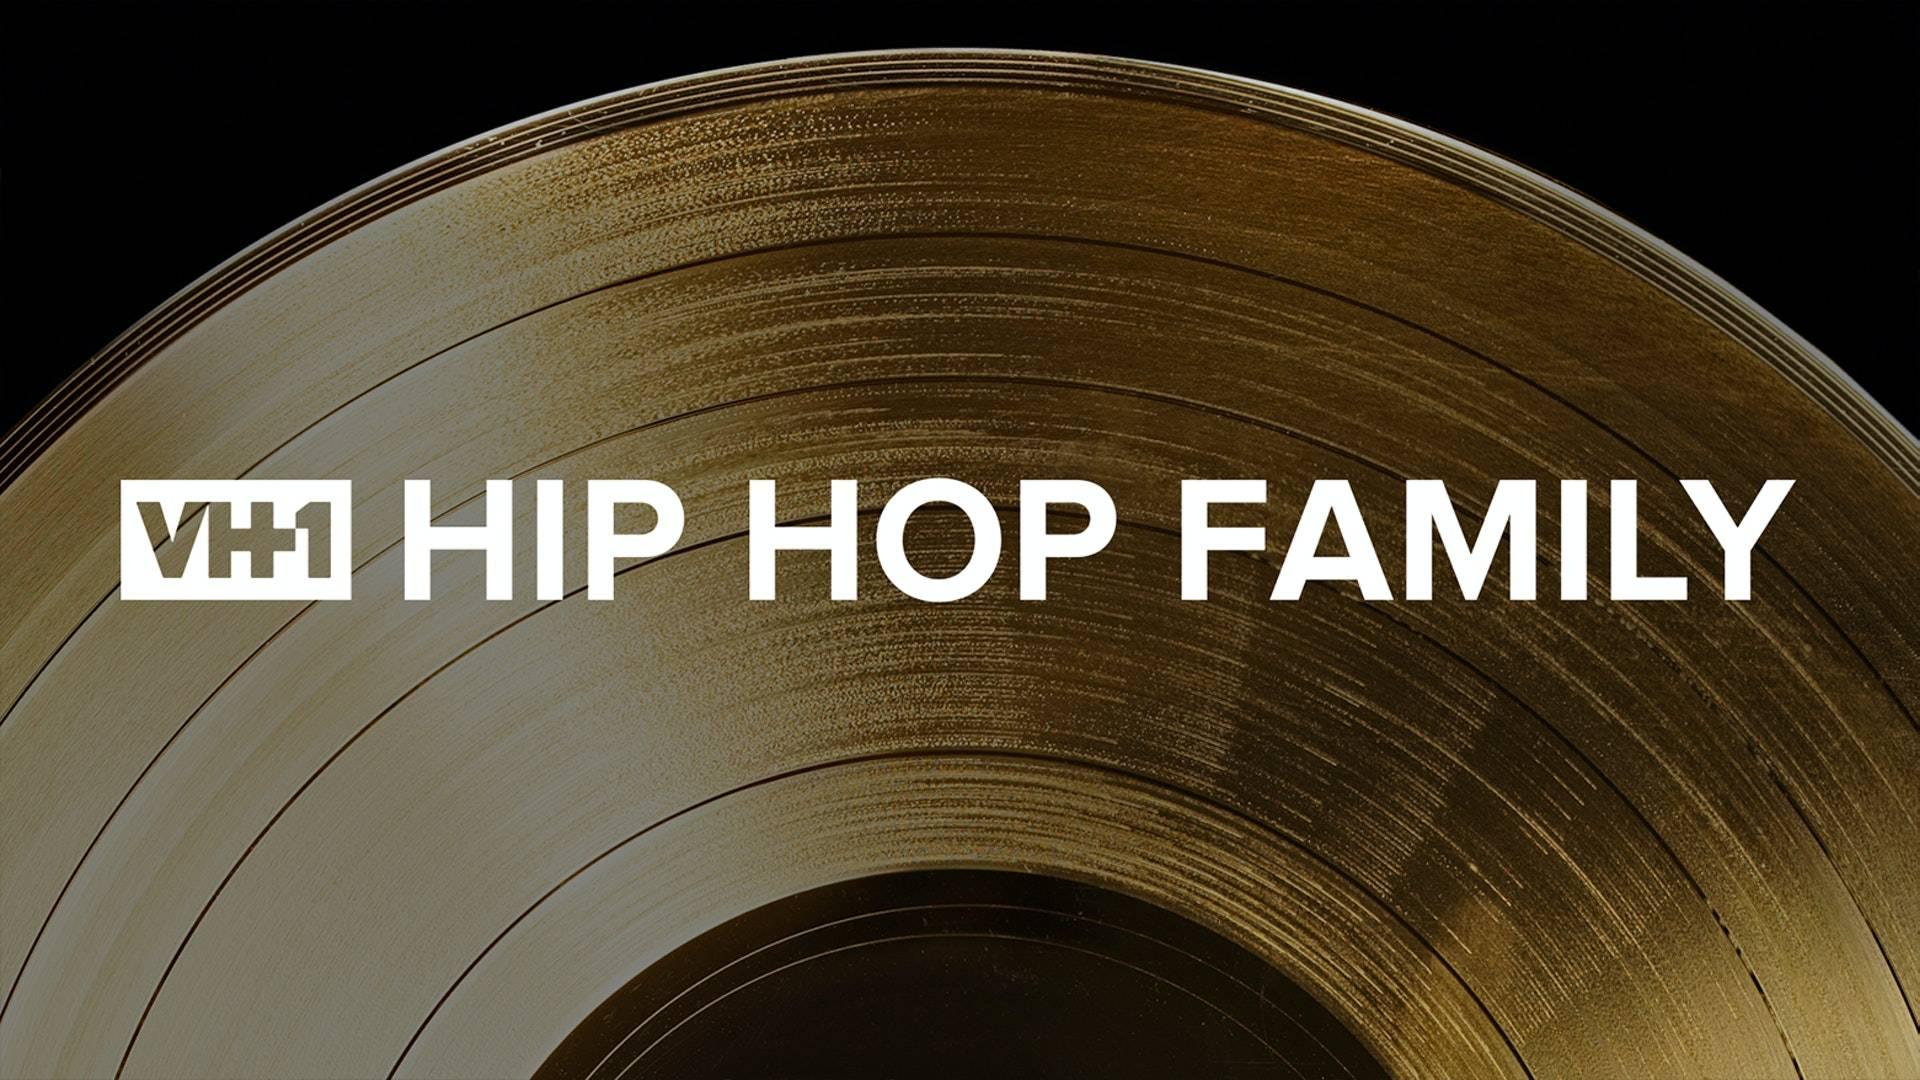 Test Pluto TV 1 - vh1 - hip hop family